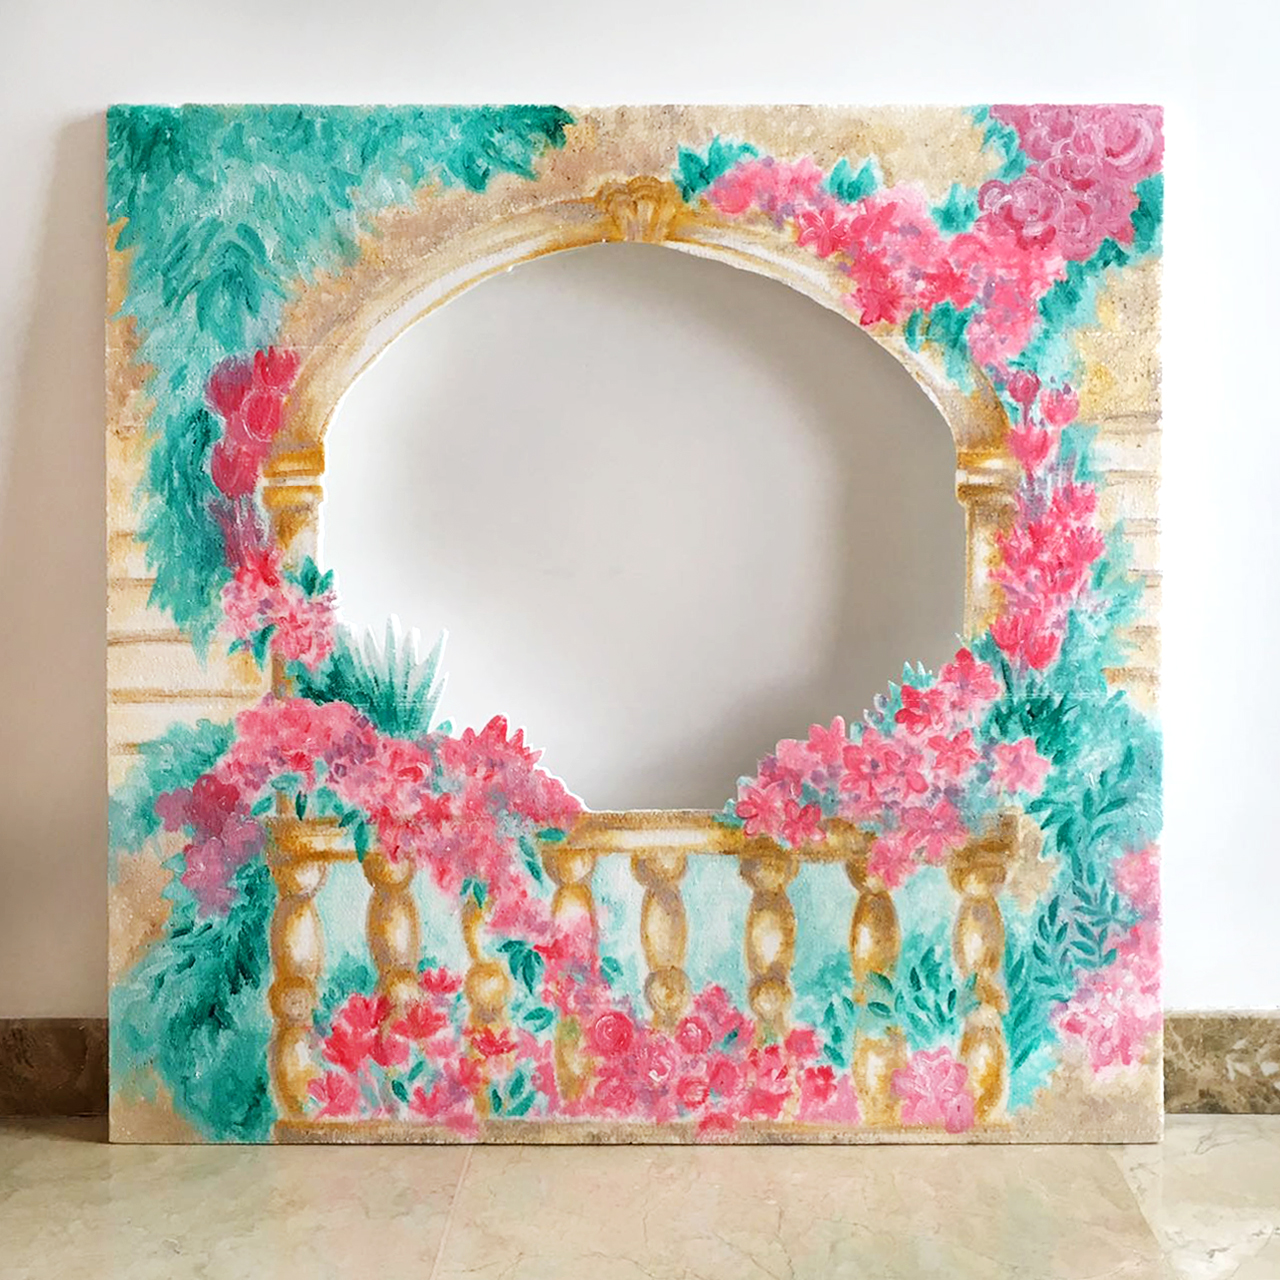 Frame Vs Shoring Prop : Frame design for photo booth galleryimage